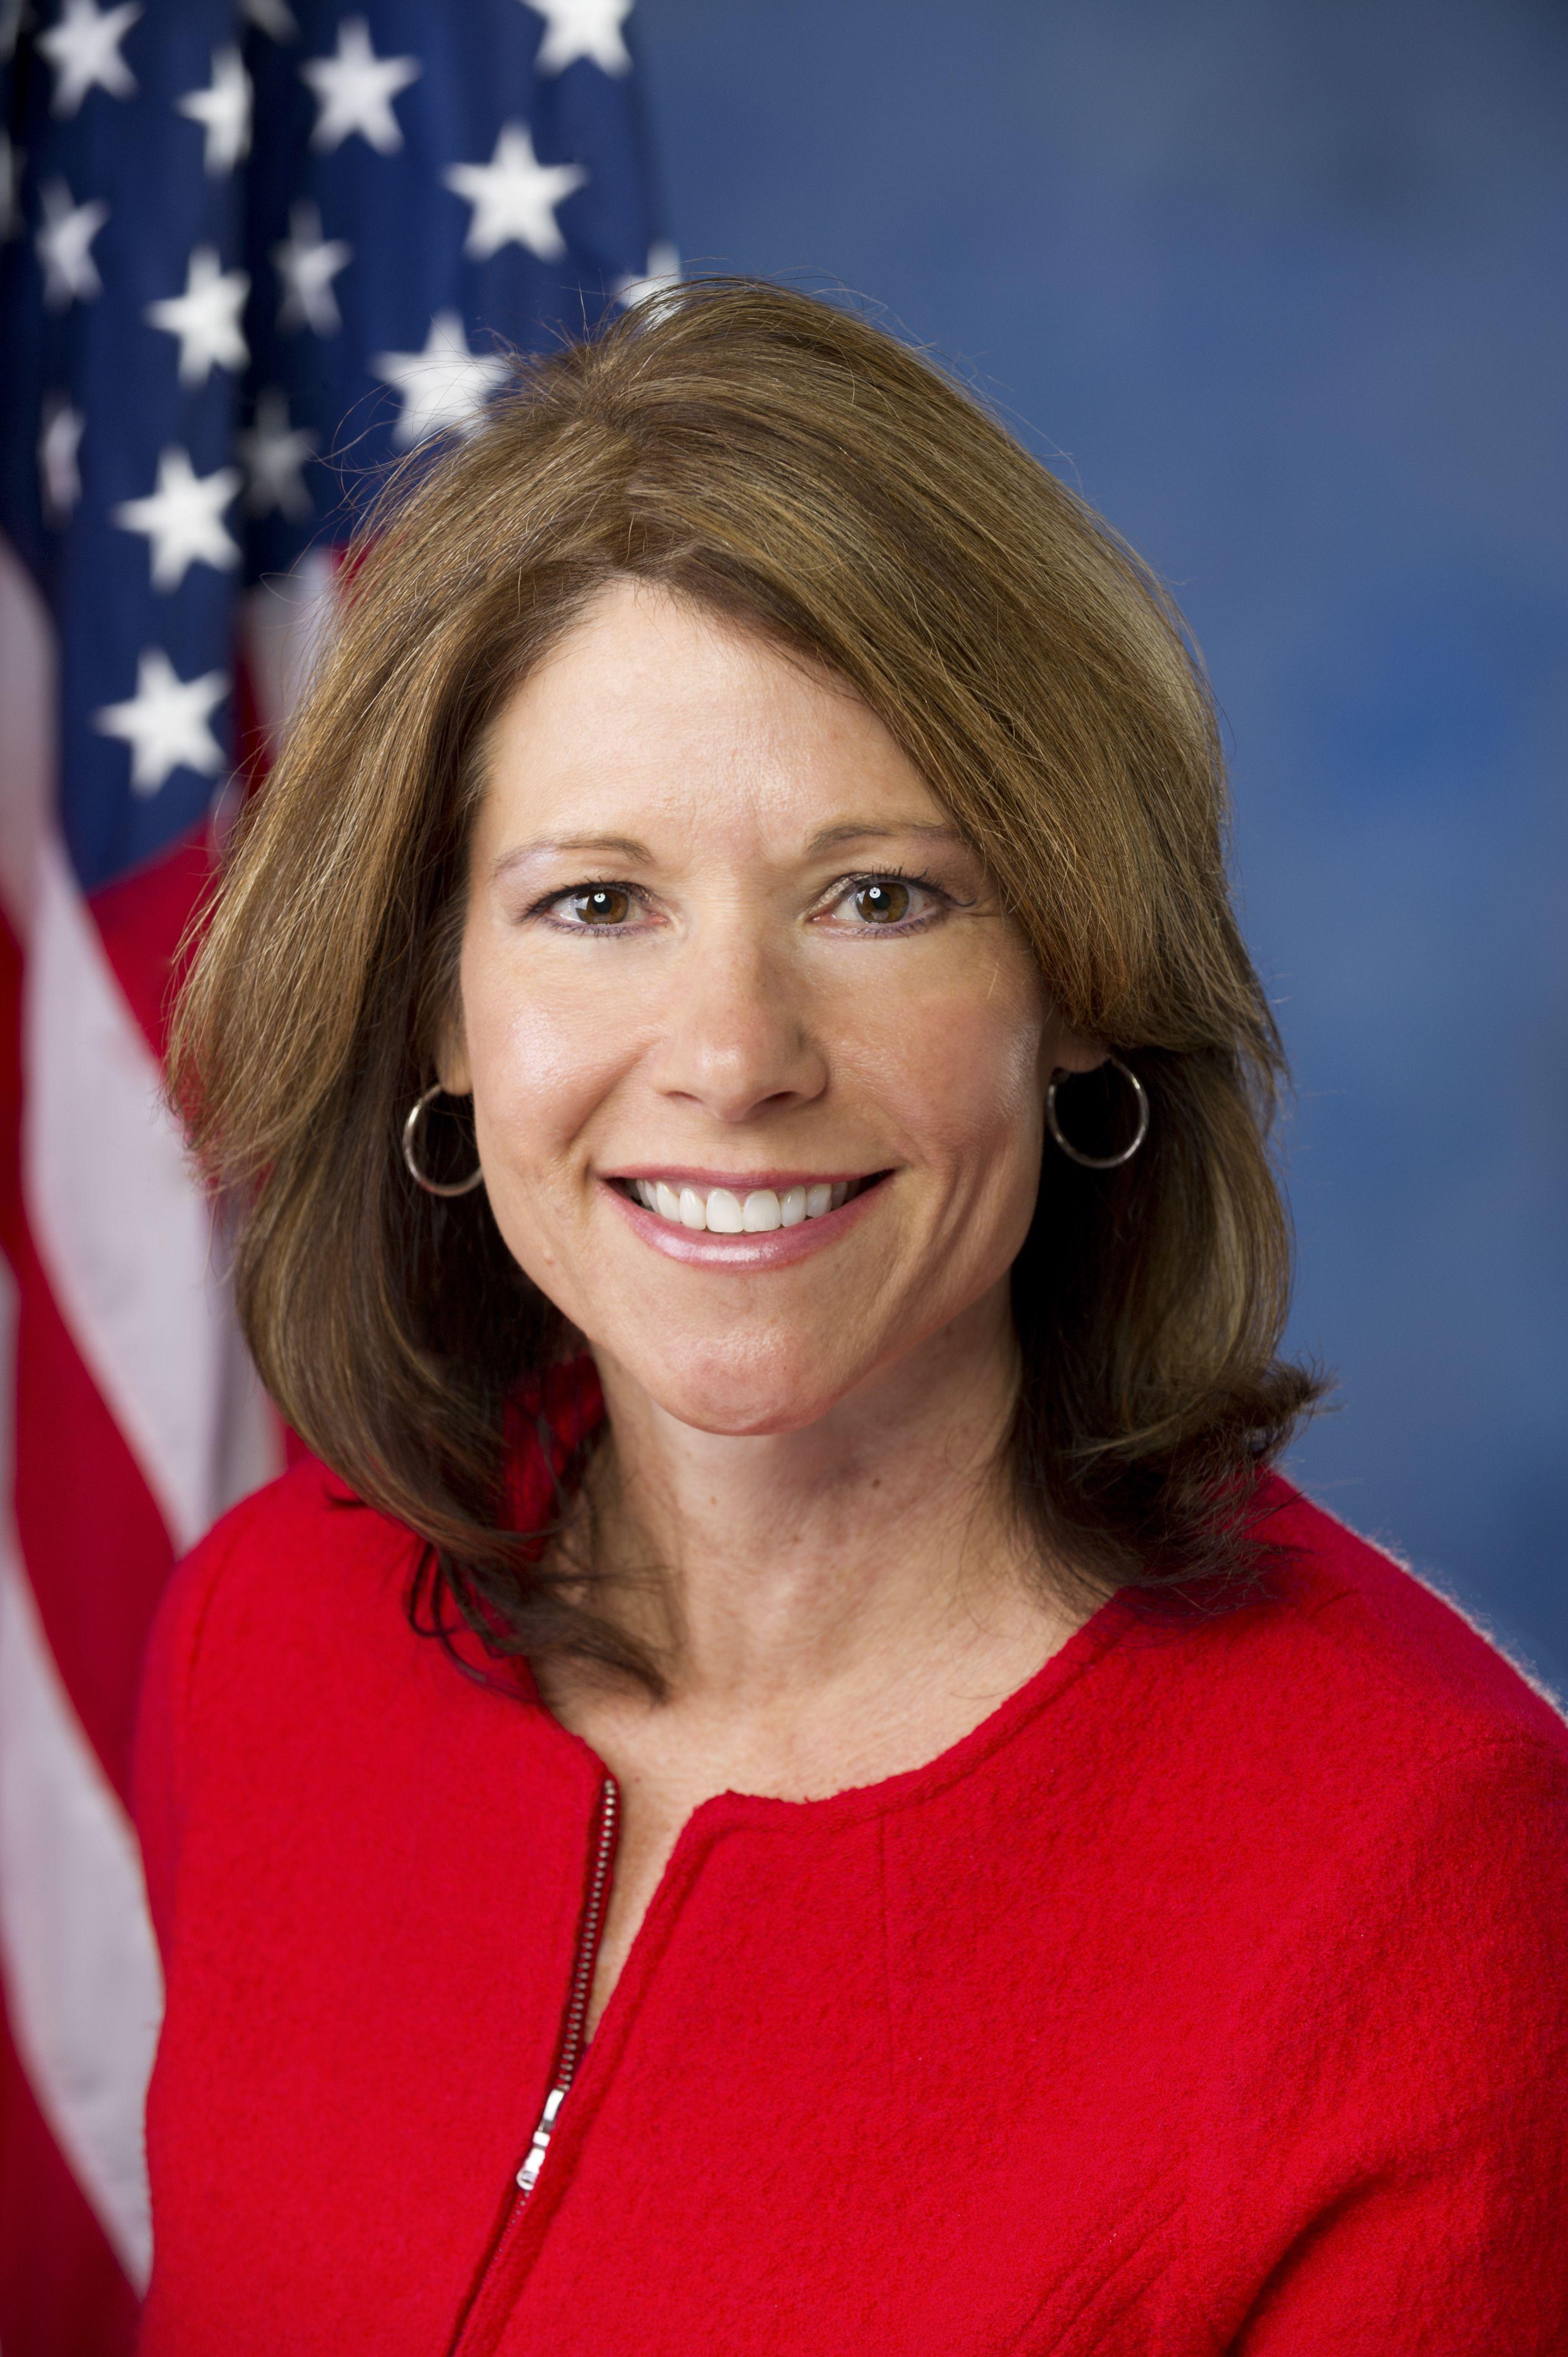 Illinois congresswoman cheri bustos carolina herrera